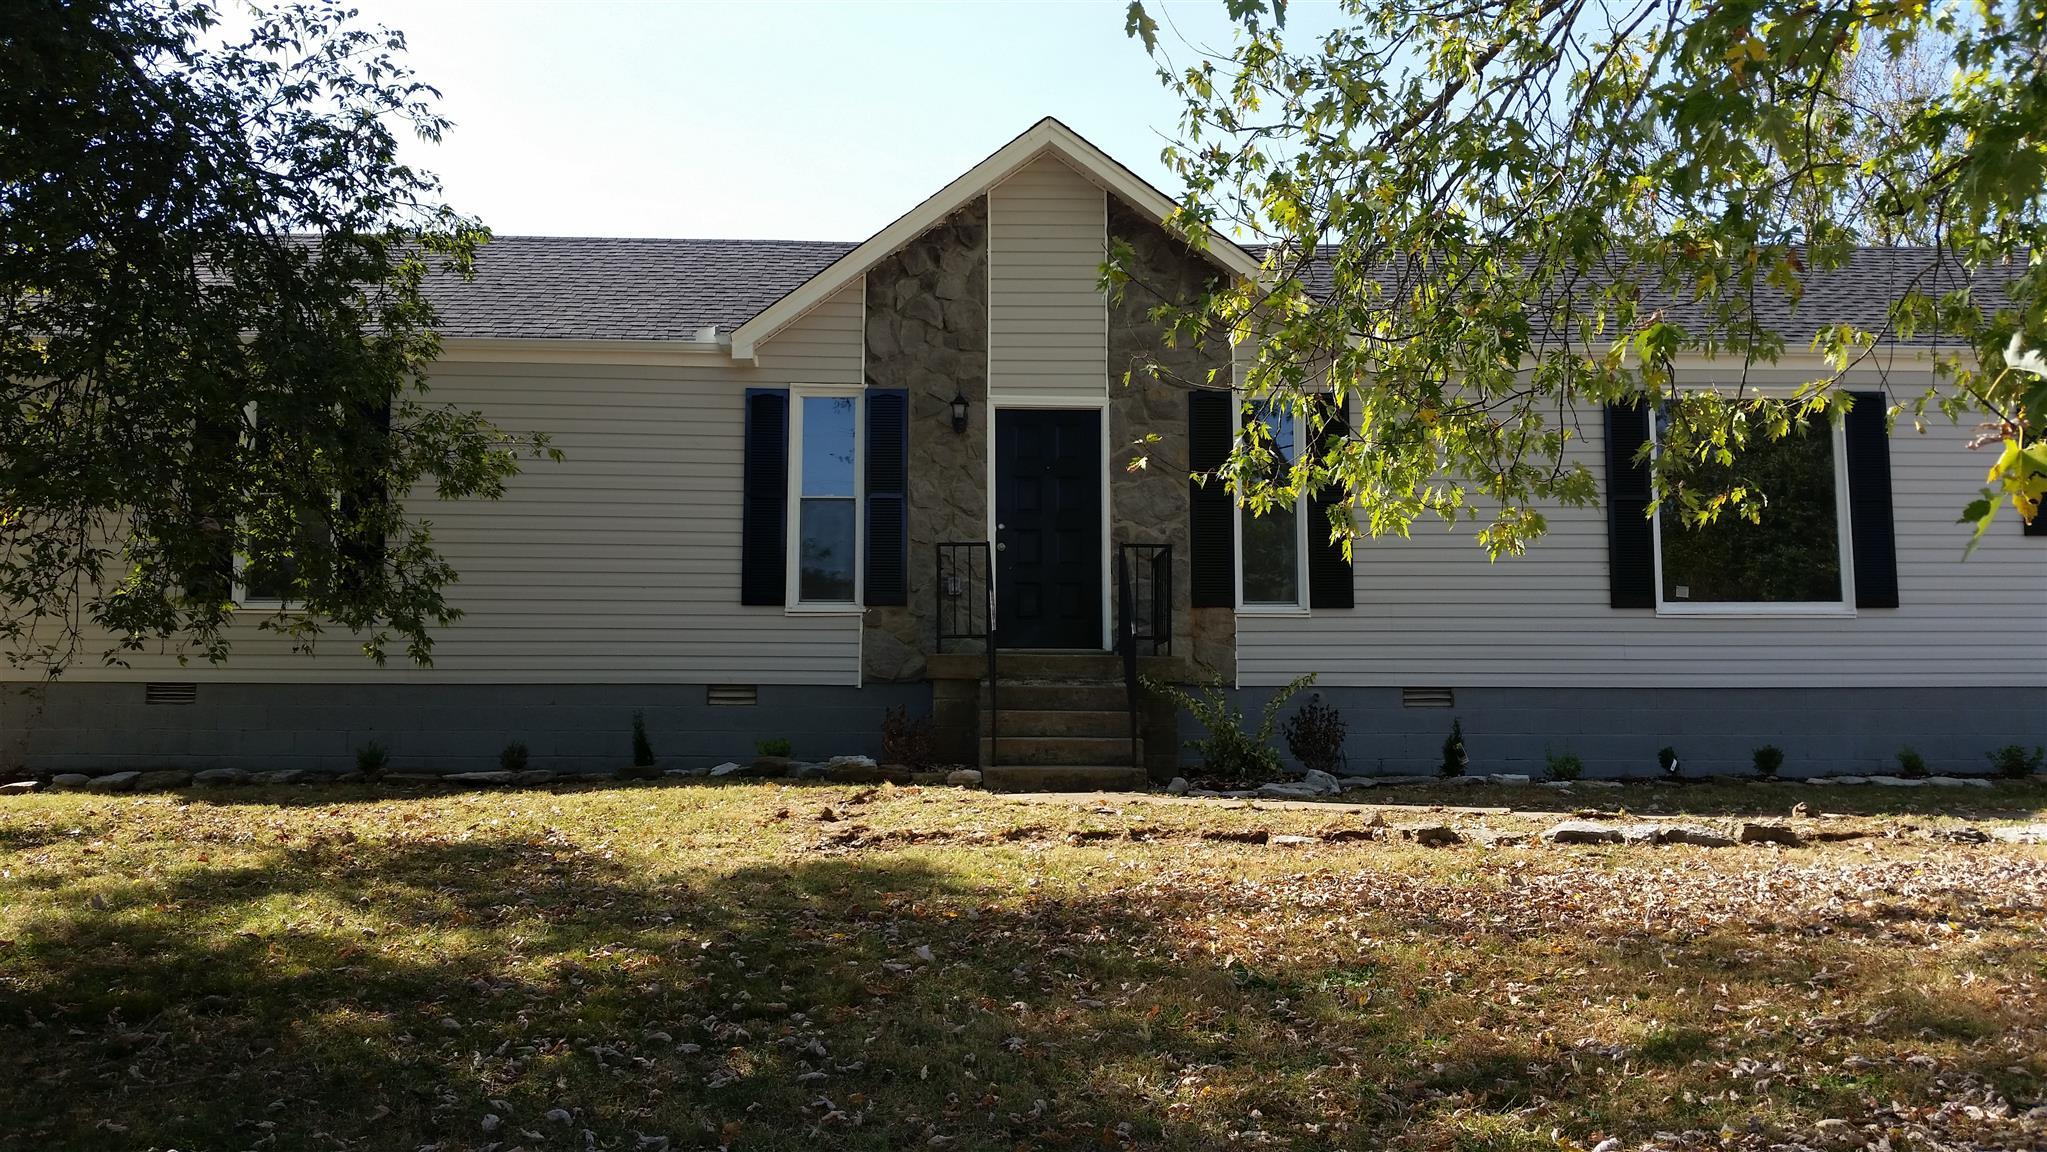 661 Meadowlark Dr, Smyrna, TN 37167